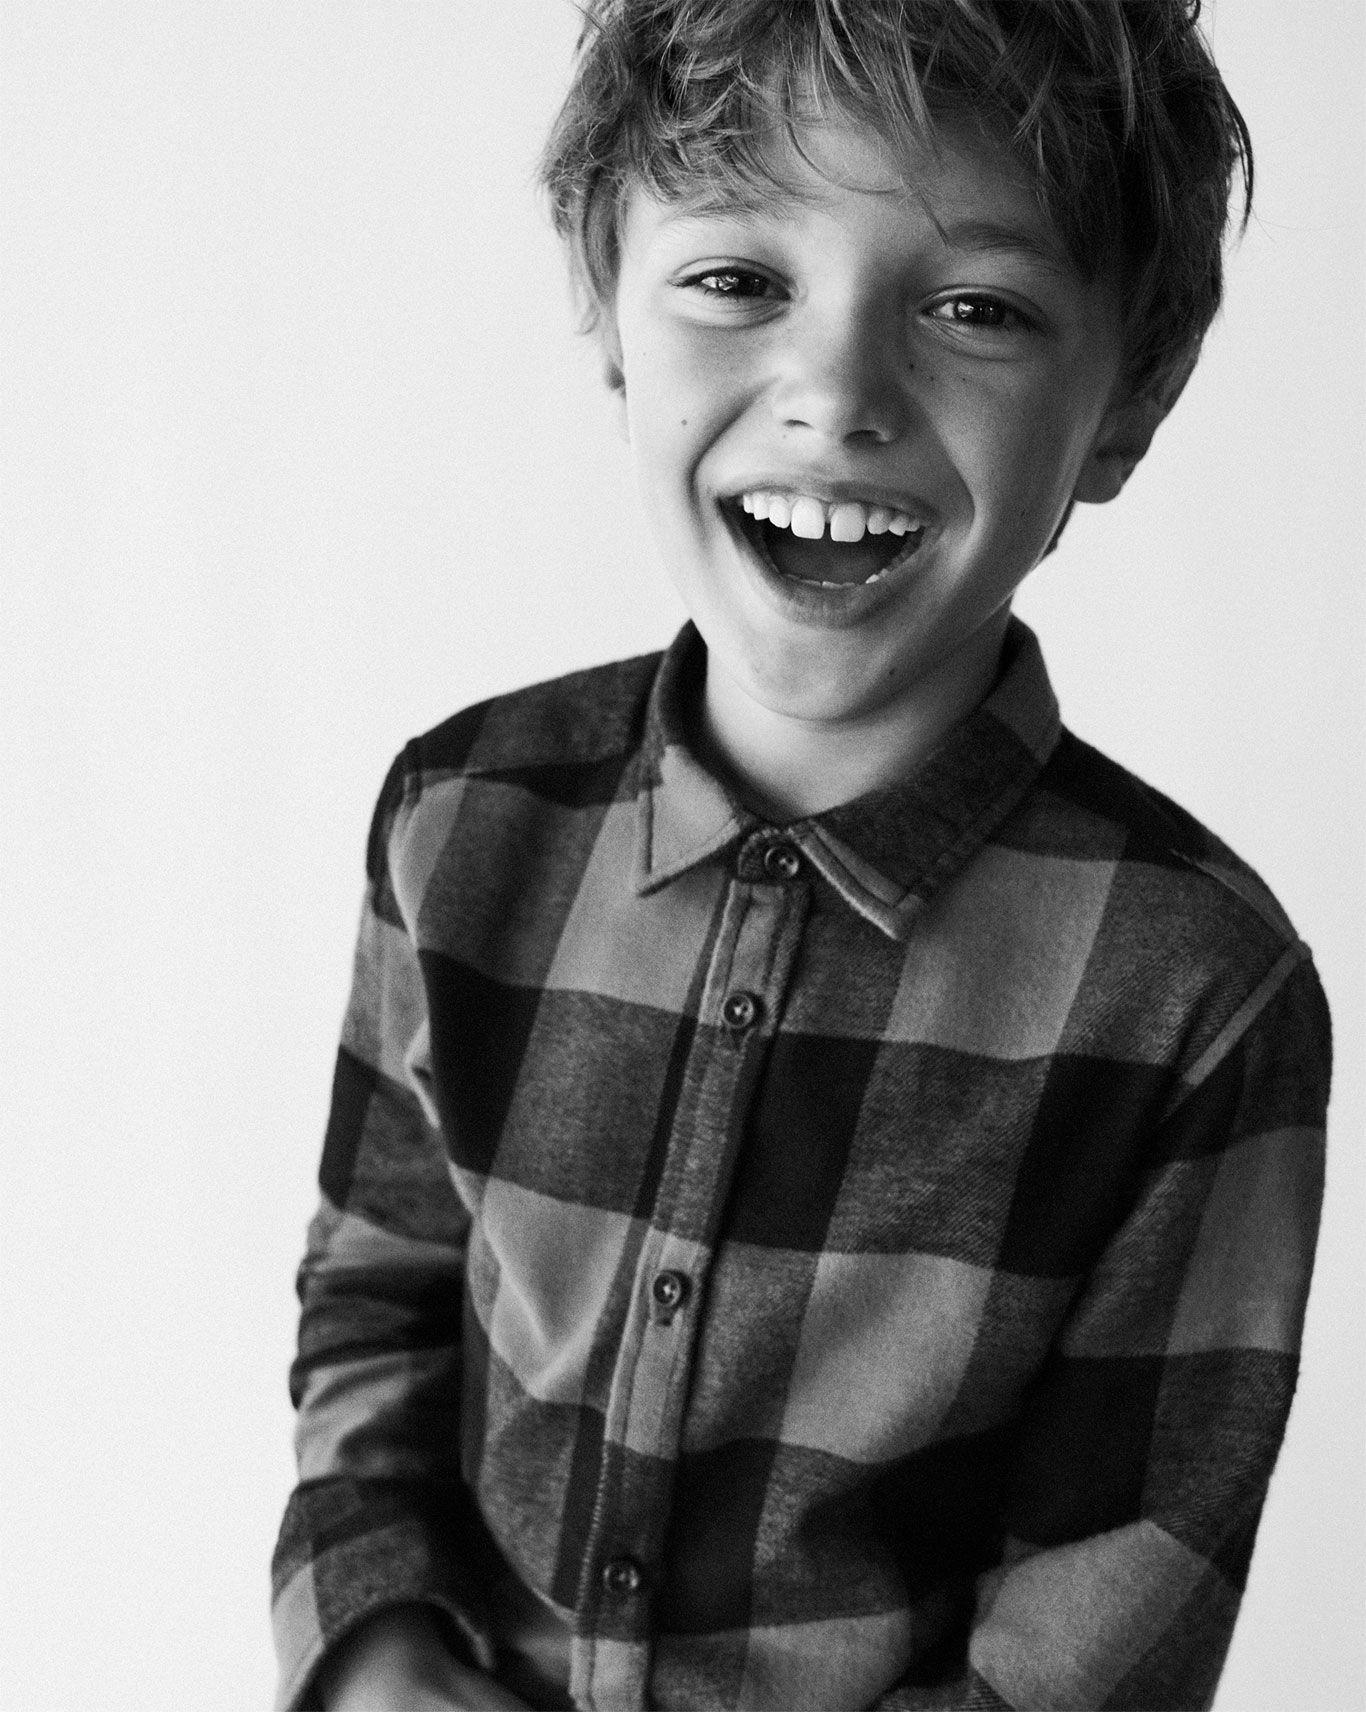 Boy haircuts age 7 back to school  zara  fashion photography kids  pinterest  kids